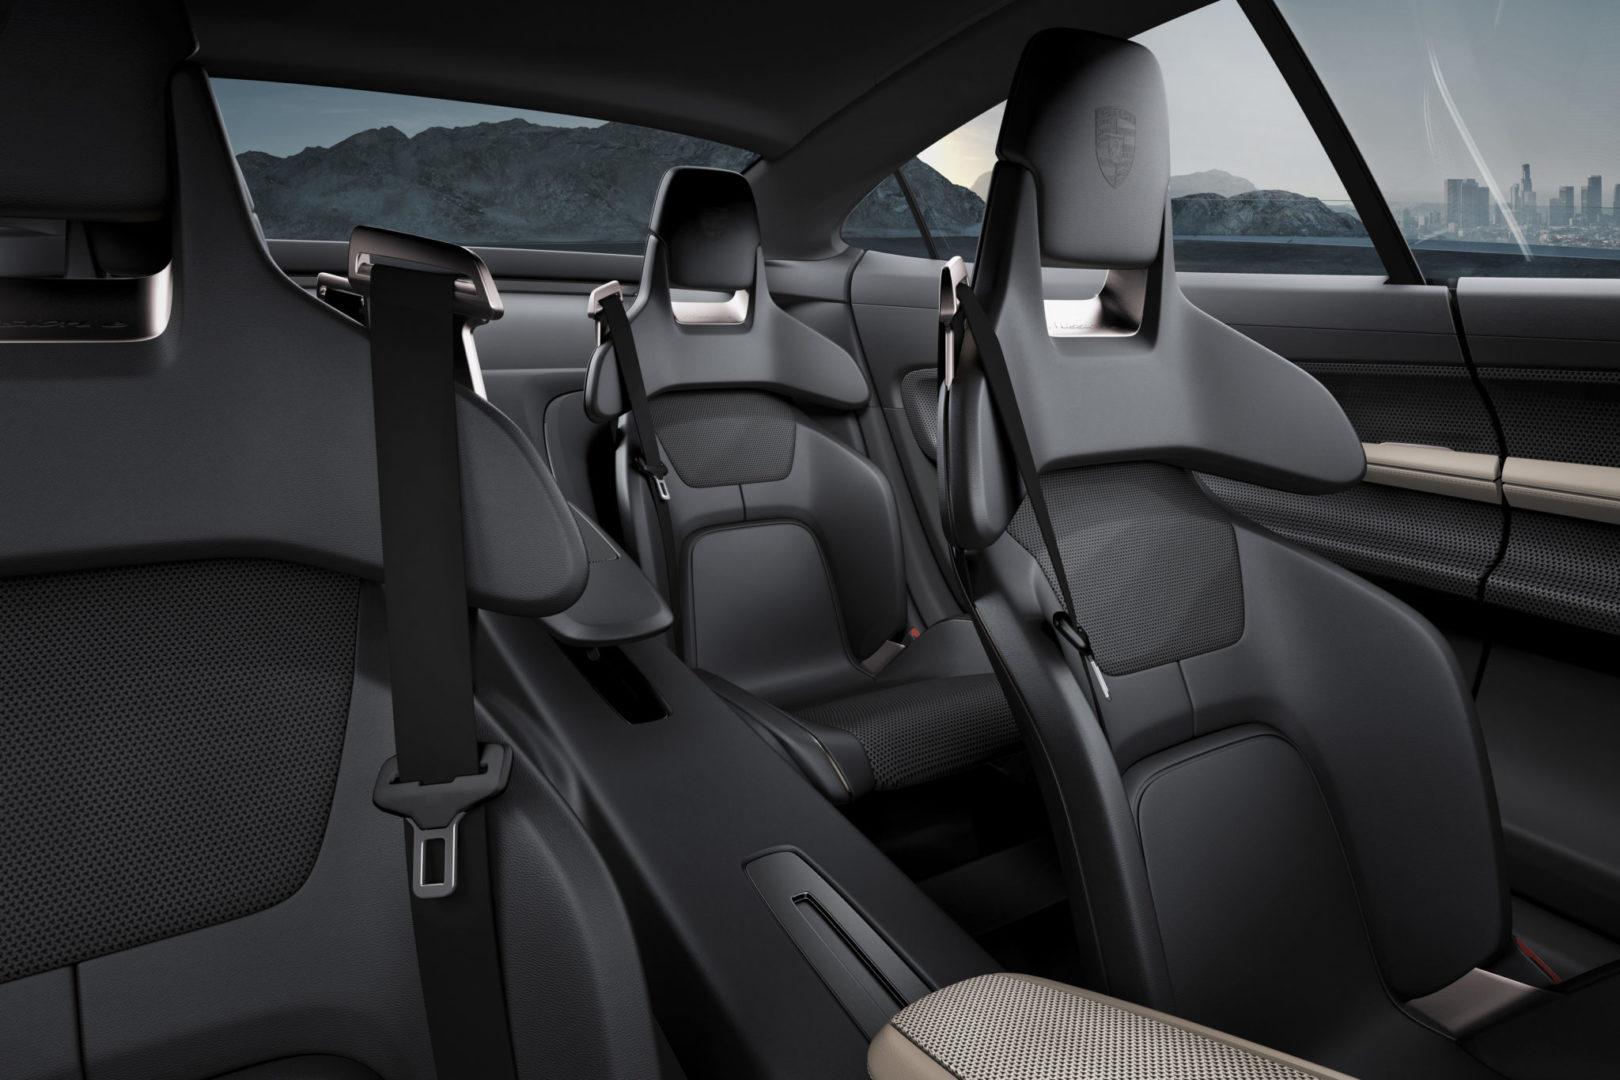 Four individual seats, like the Panamera